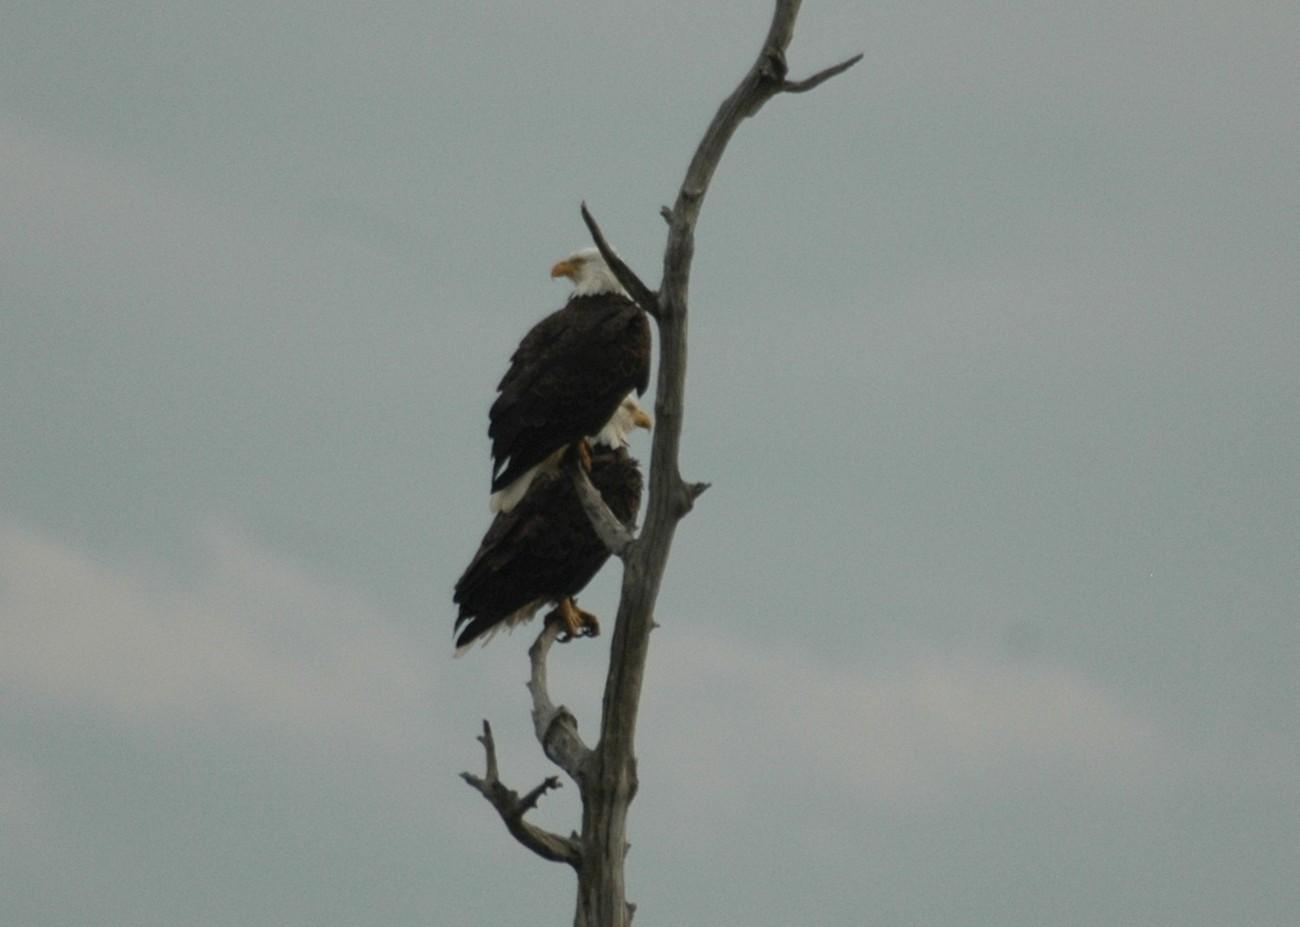 Blackwater National Wildlife Refuge Cambridge, Maryland Blackwater River, Blackwater Swamp,